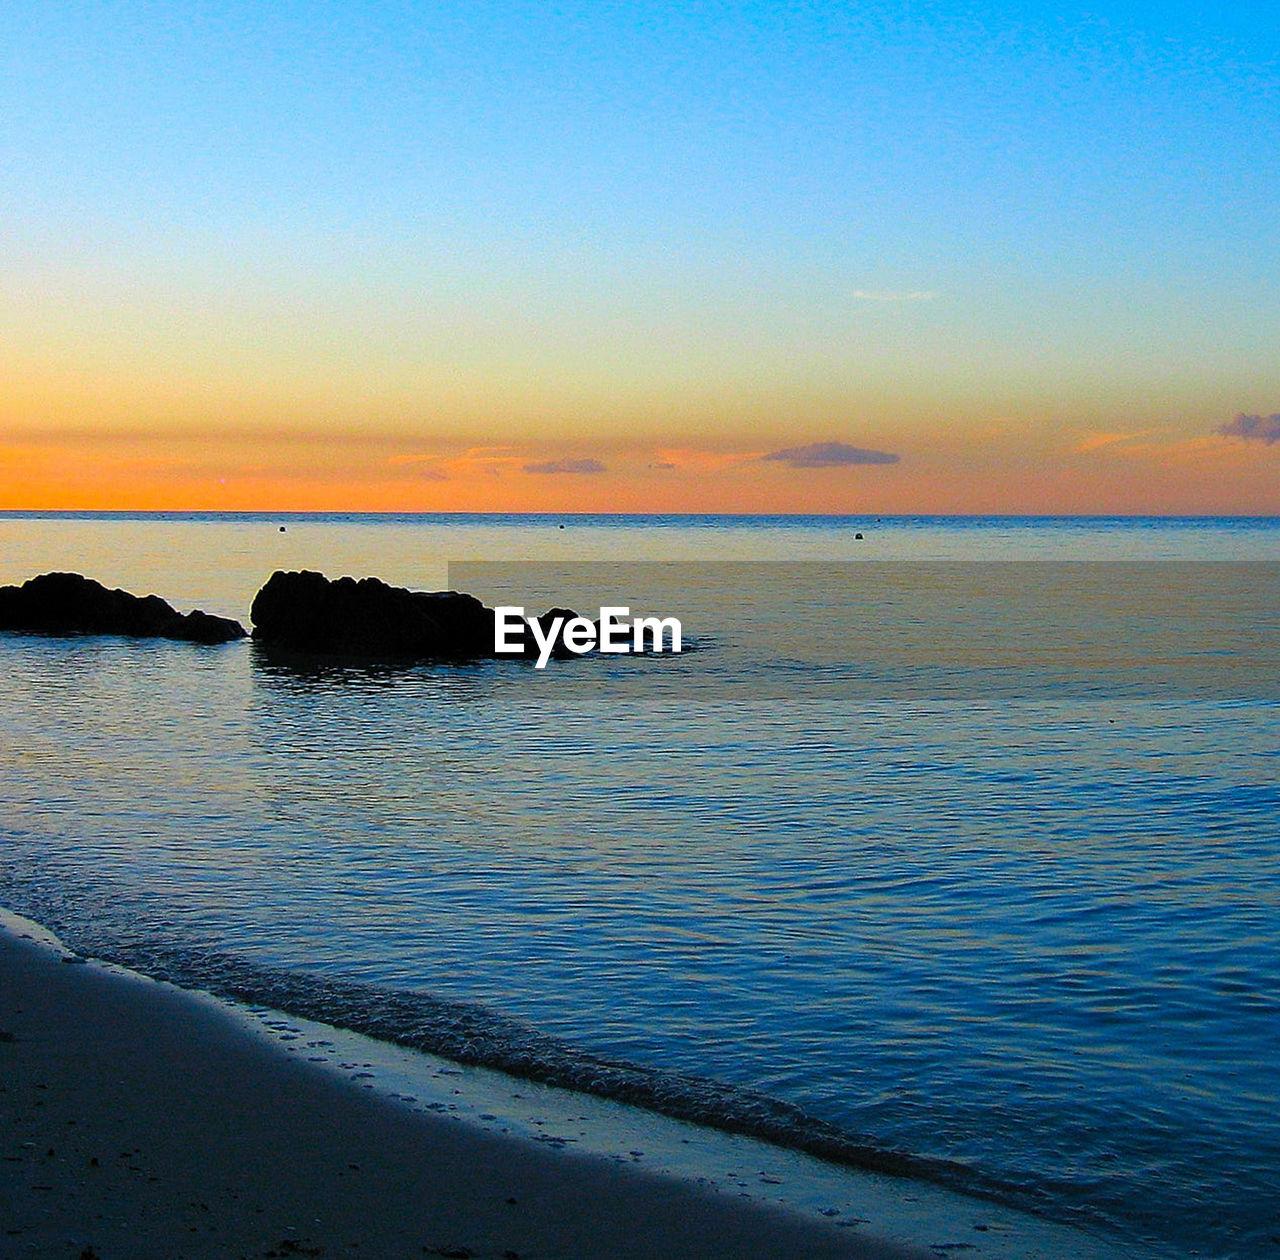 water, sea, sky, scenics - nature, beauty in nature, sunset, tranquil scene, tranquility, horizon over water, horizon, beach, land, idyllic, no people, orange color, nature, cloud - sky, non-urban scene, outdoors